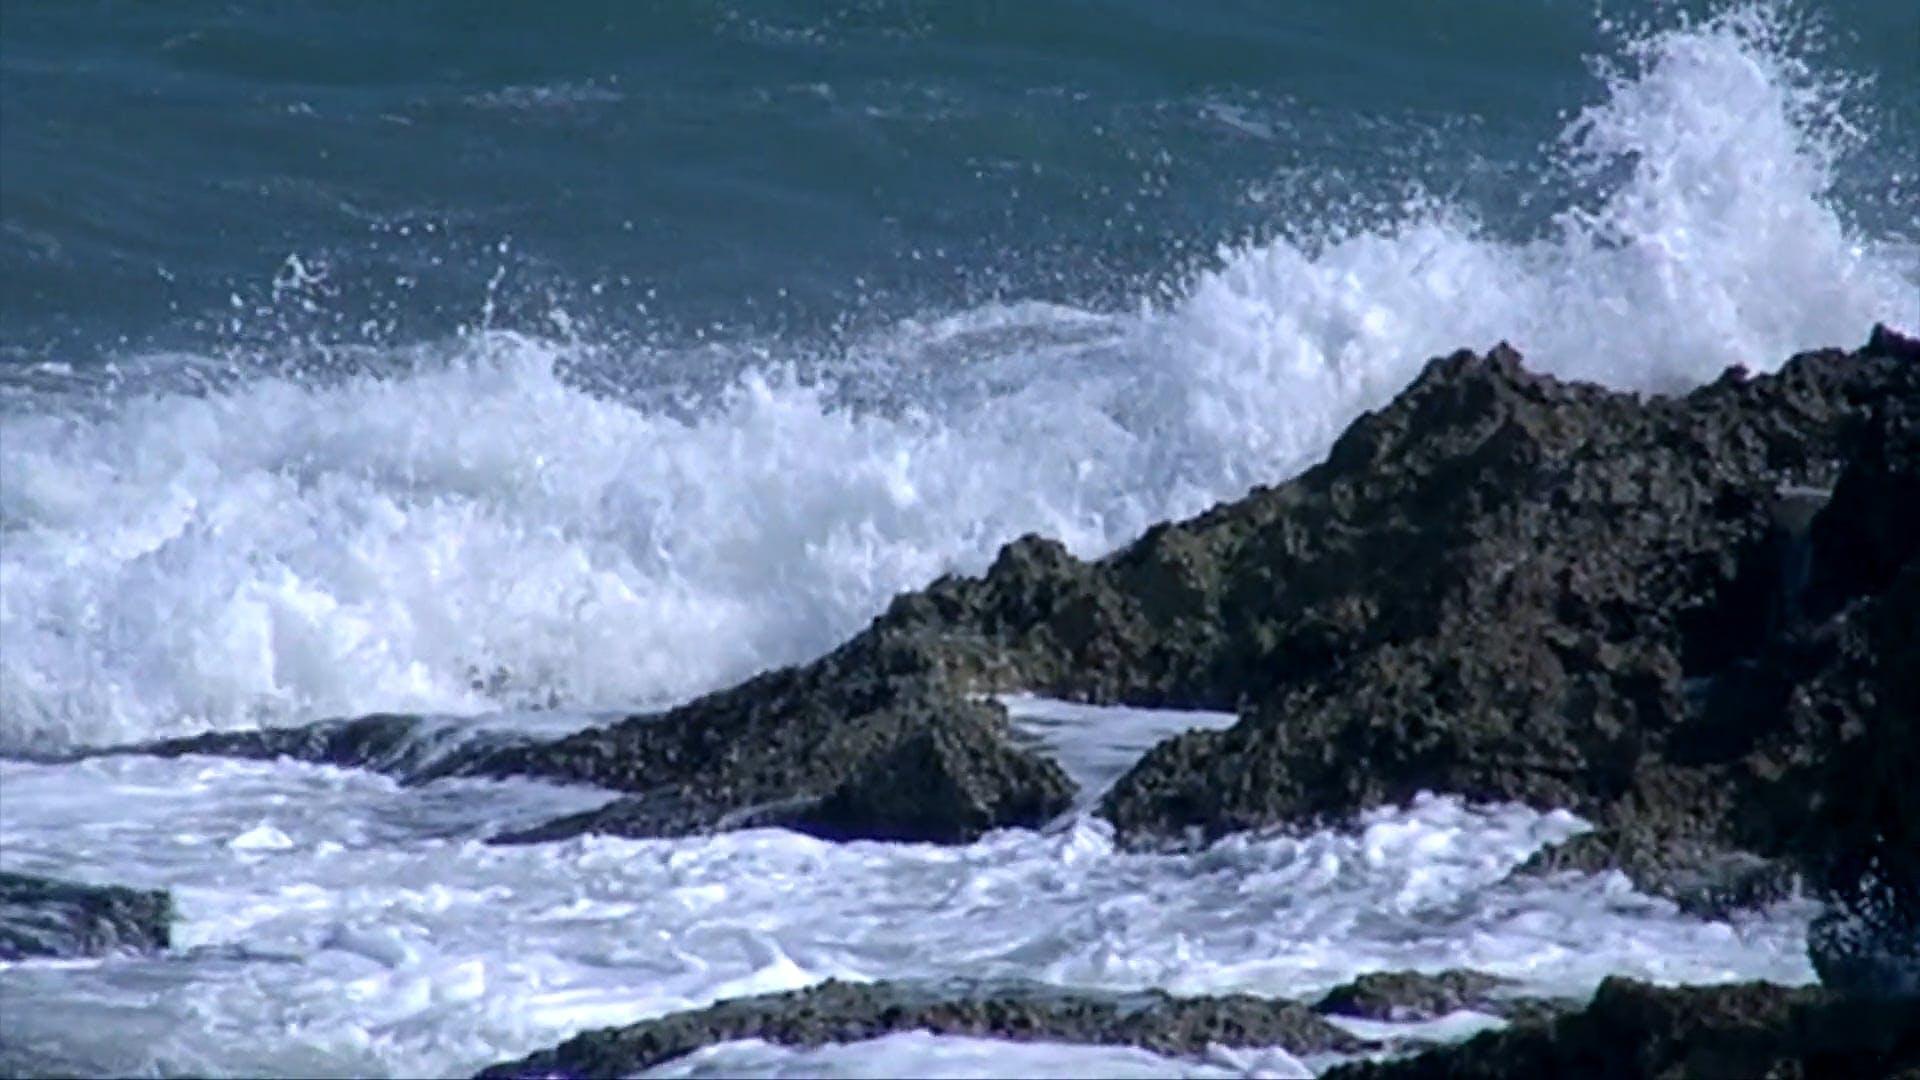 Waves Crashing To The Rocks